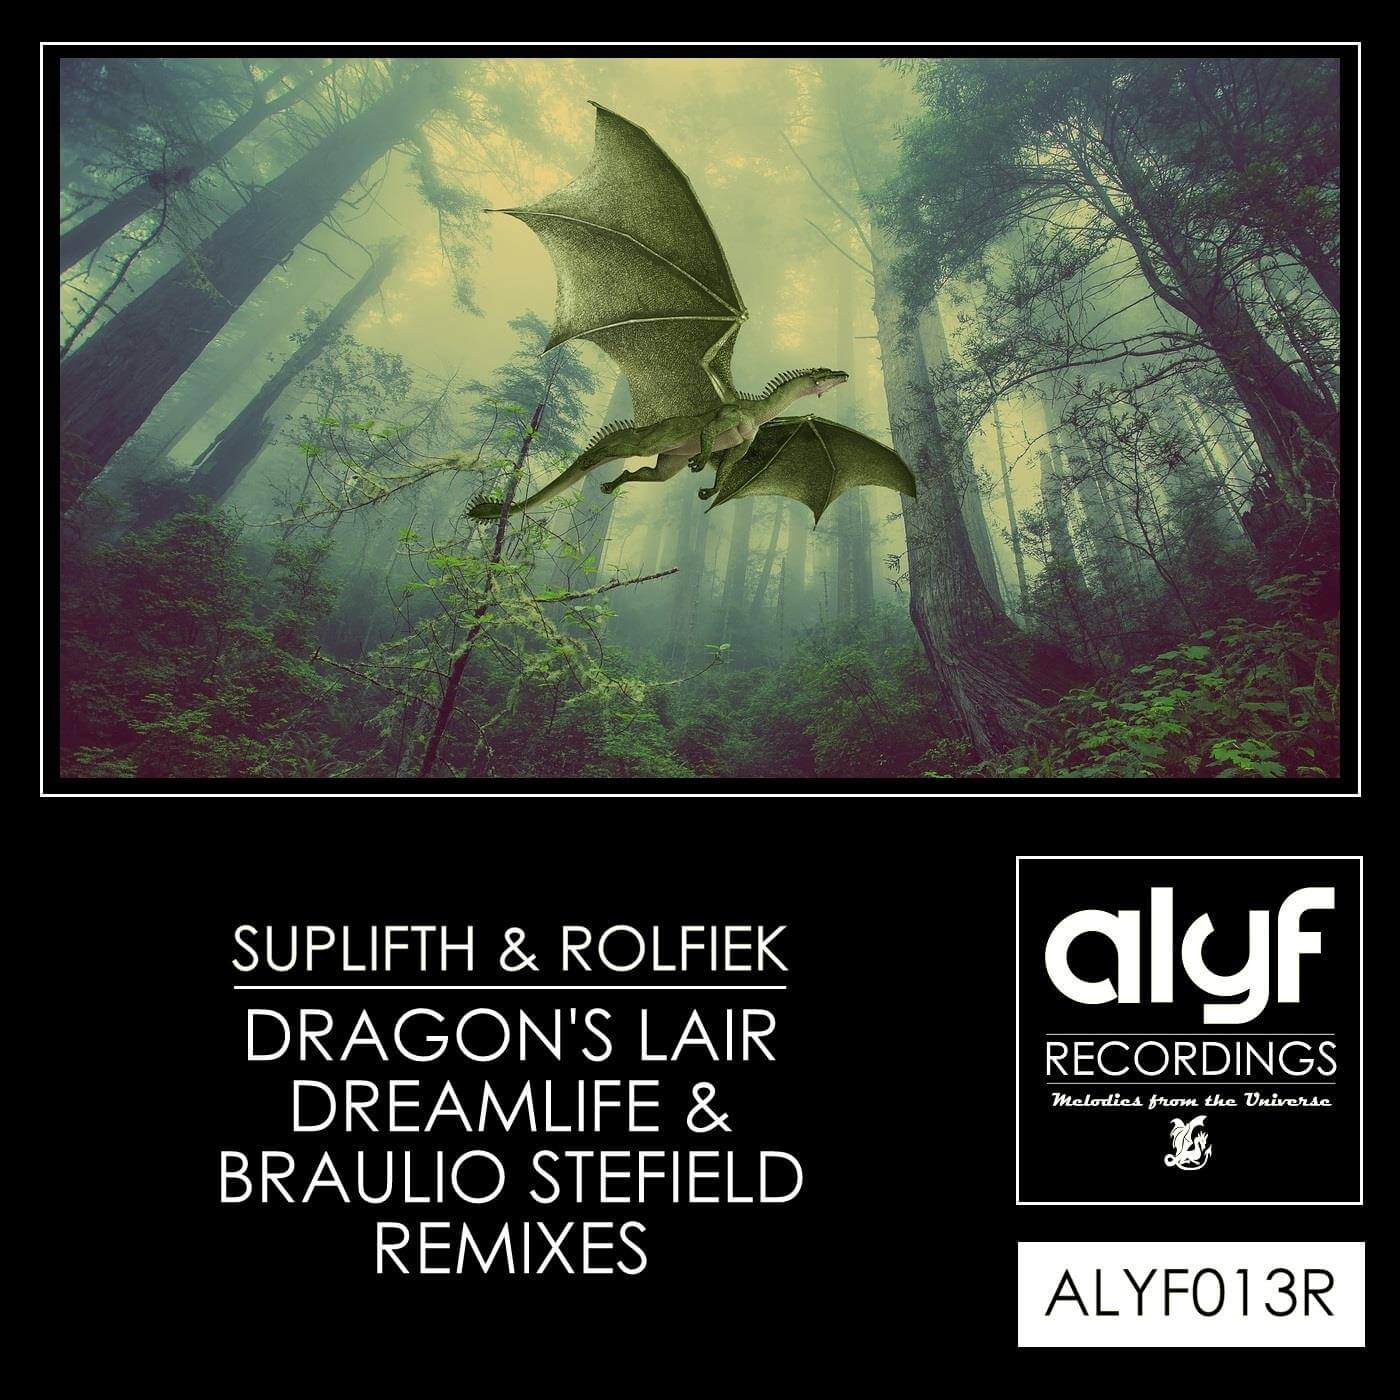 Suplifth & Rolfiek - Dragon's Lair (DreamLife Remix)